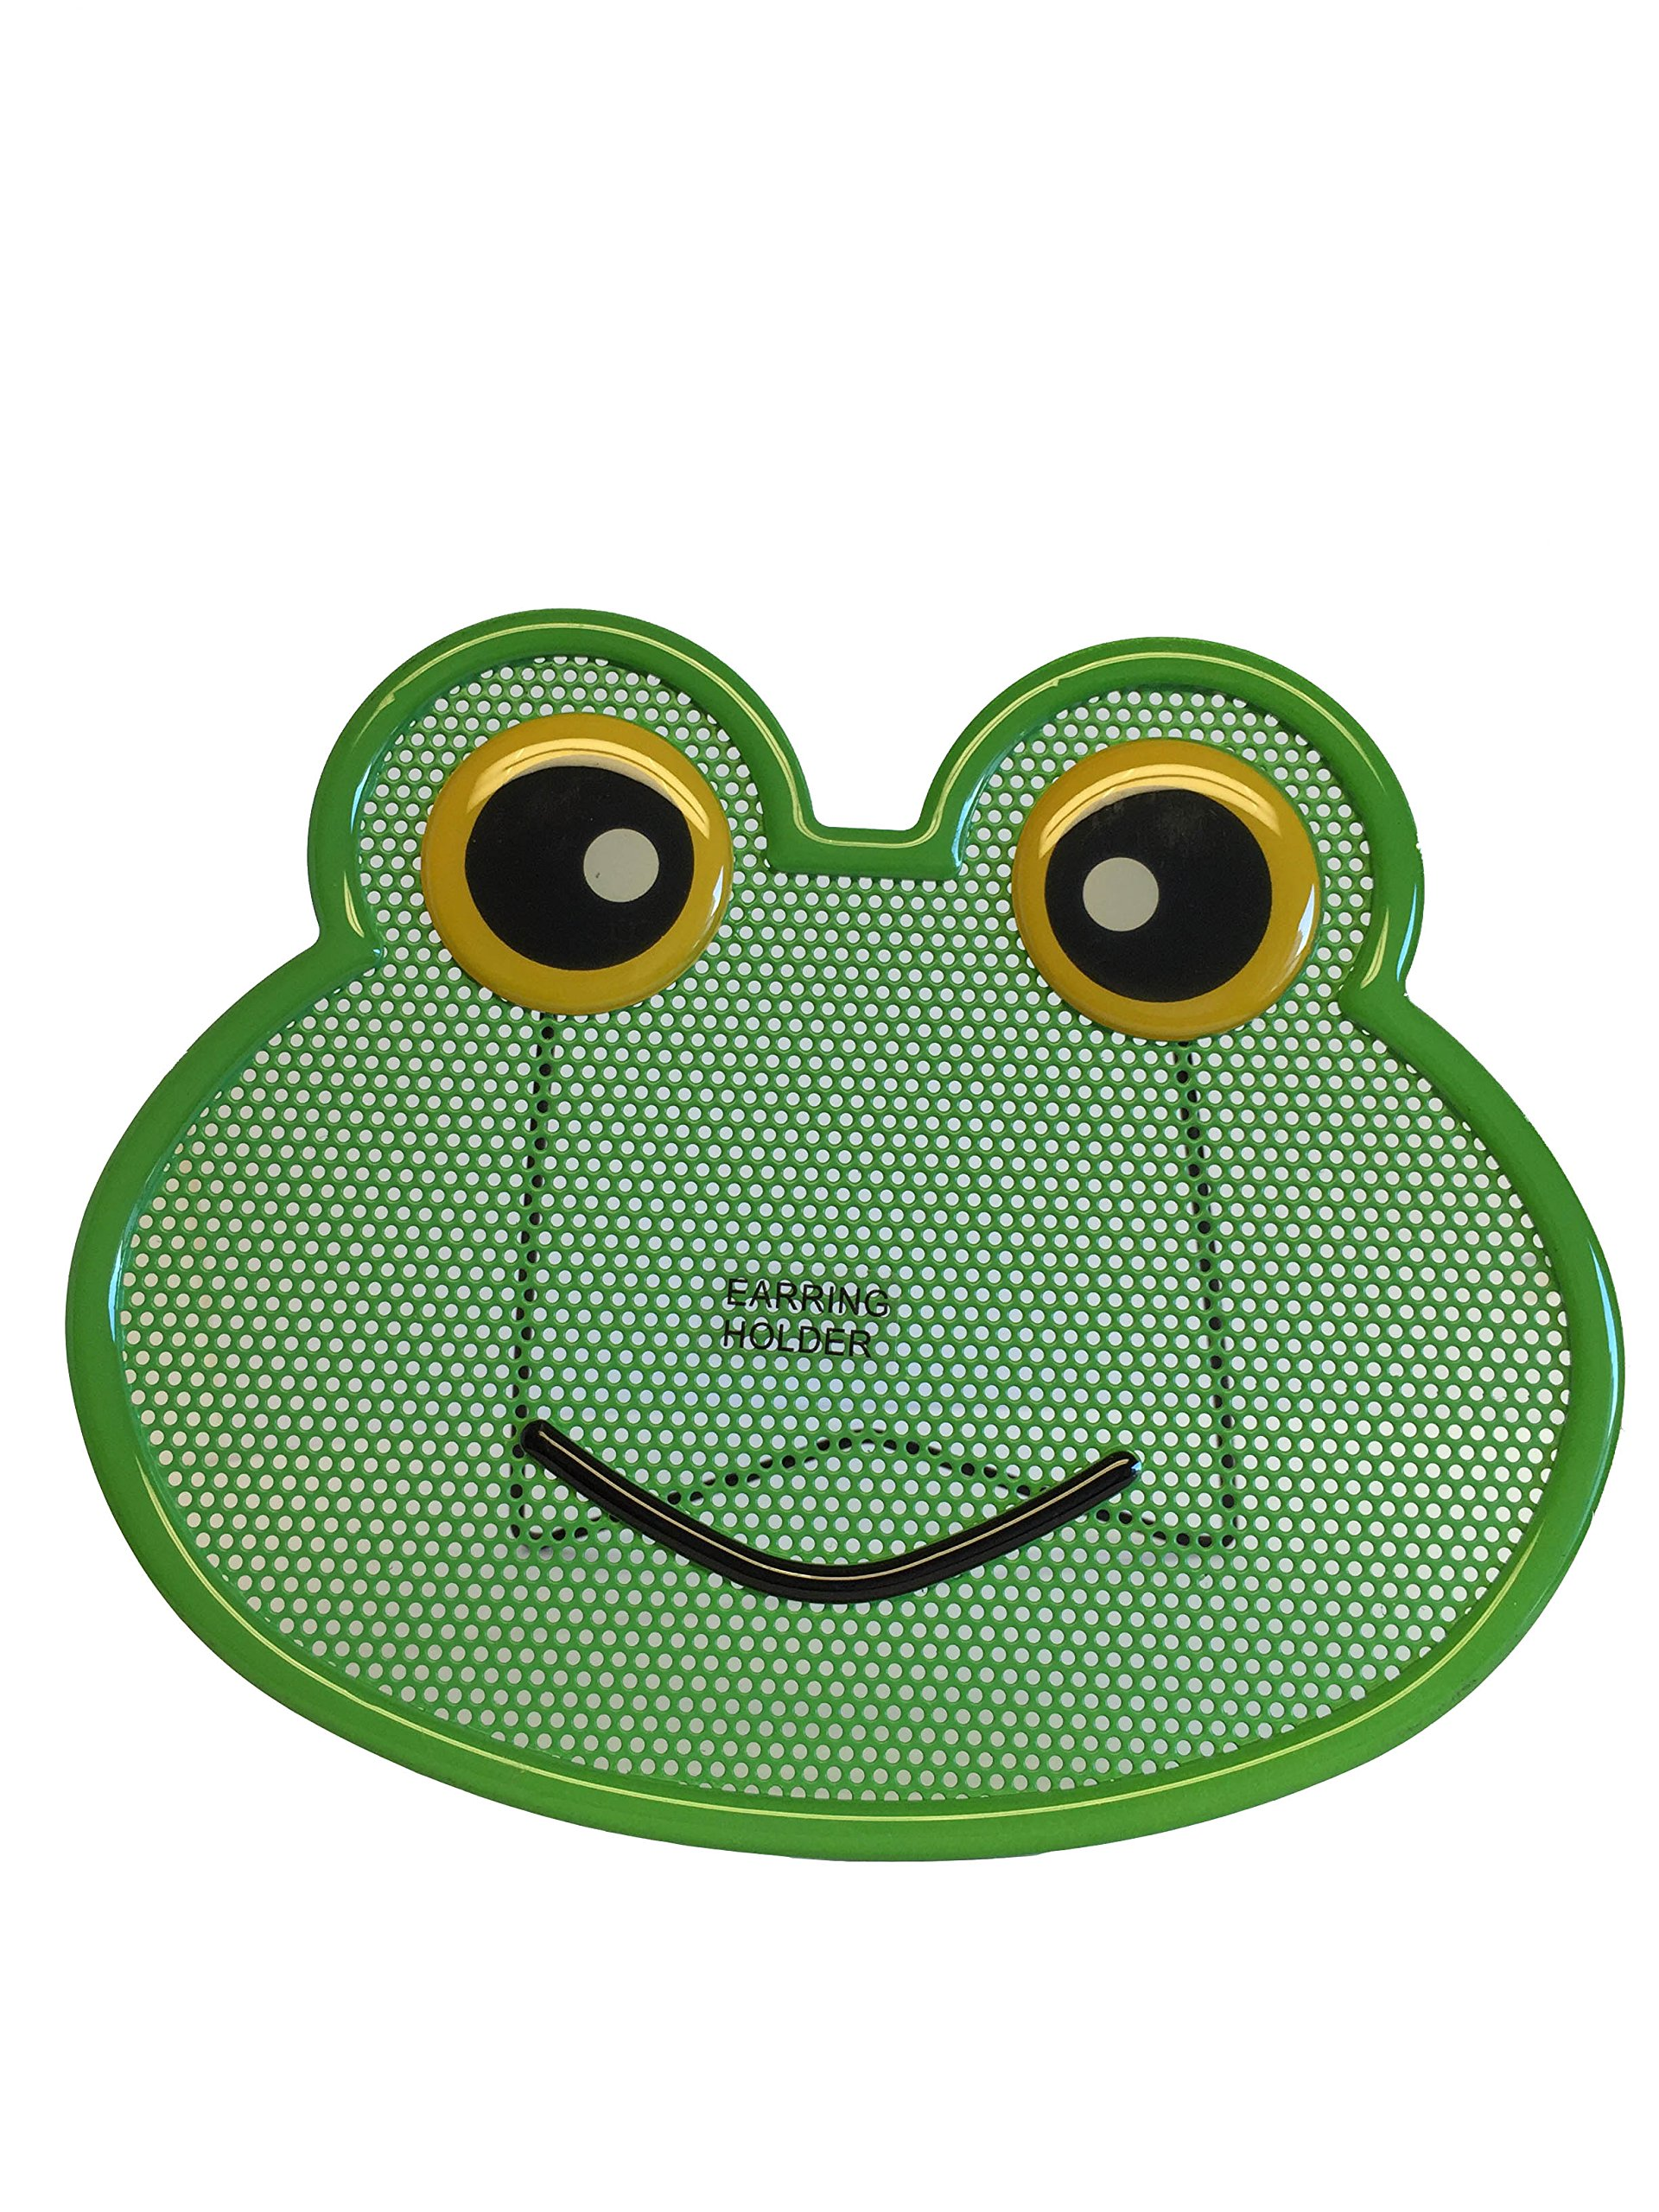 Frog Earring Holder / Earring Tree / Earring Organizer / Earring Stand / Earring Display